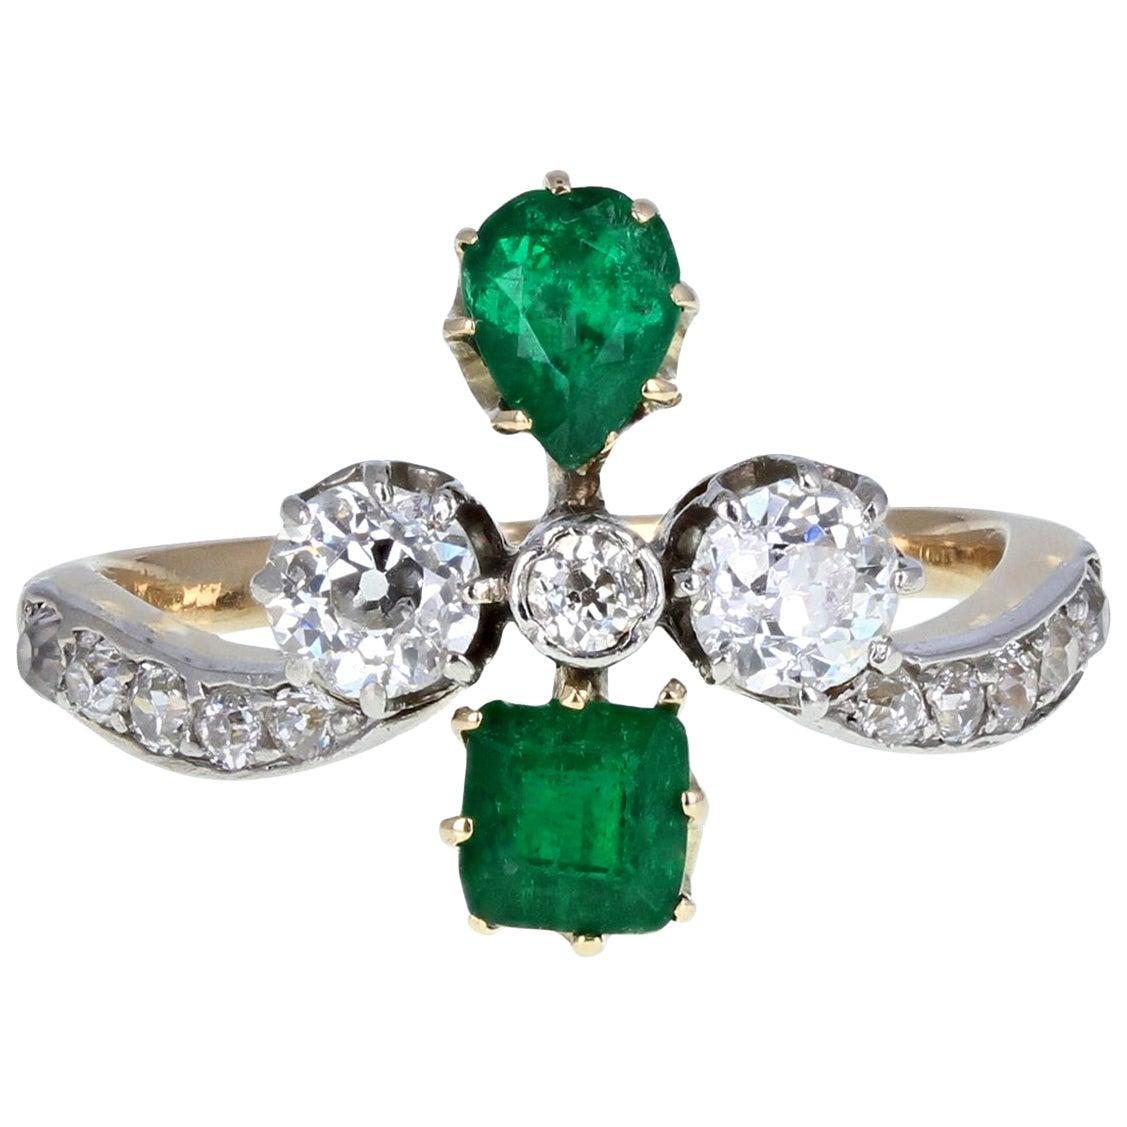 Antique Victorian 18 Carat Emerald Diamond Cluster Ring